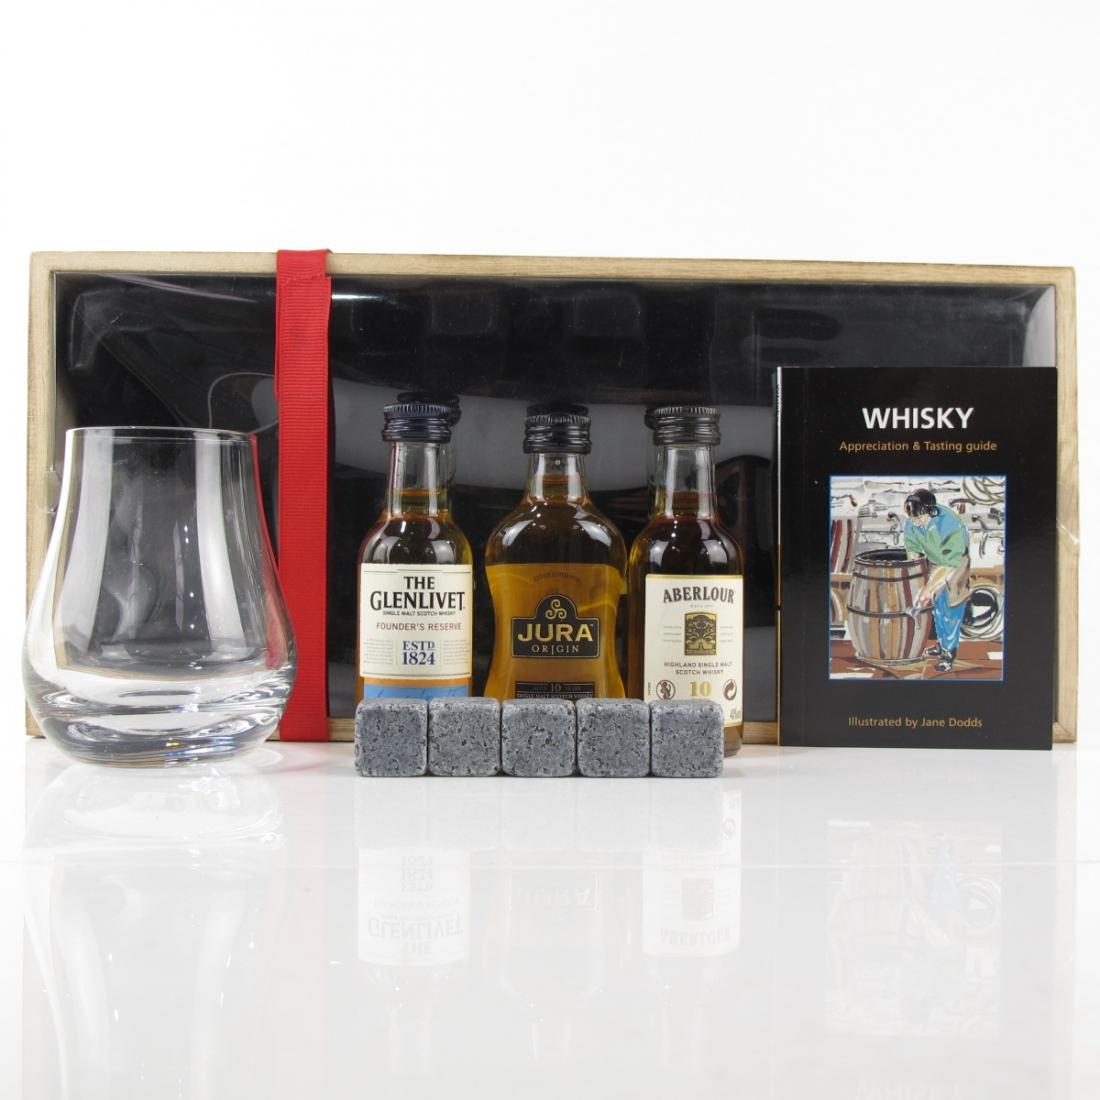 Whisky Appreciation Set / Glenlivet / Jura / Aberlour / 3 x 5cl